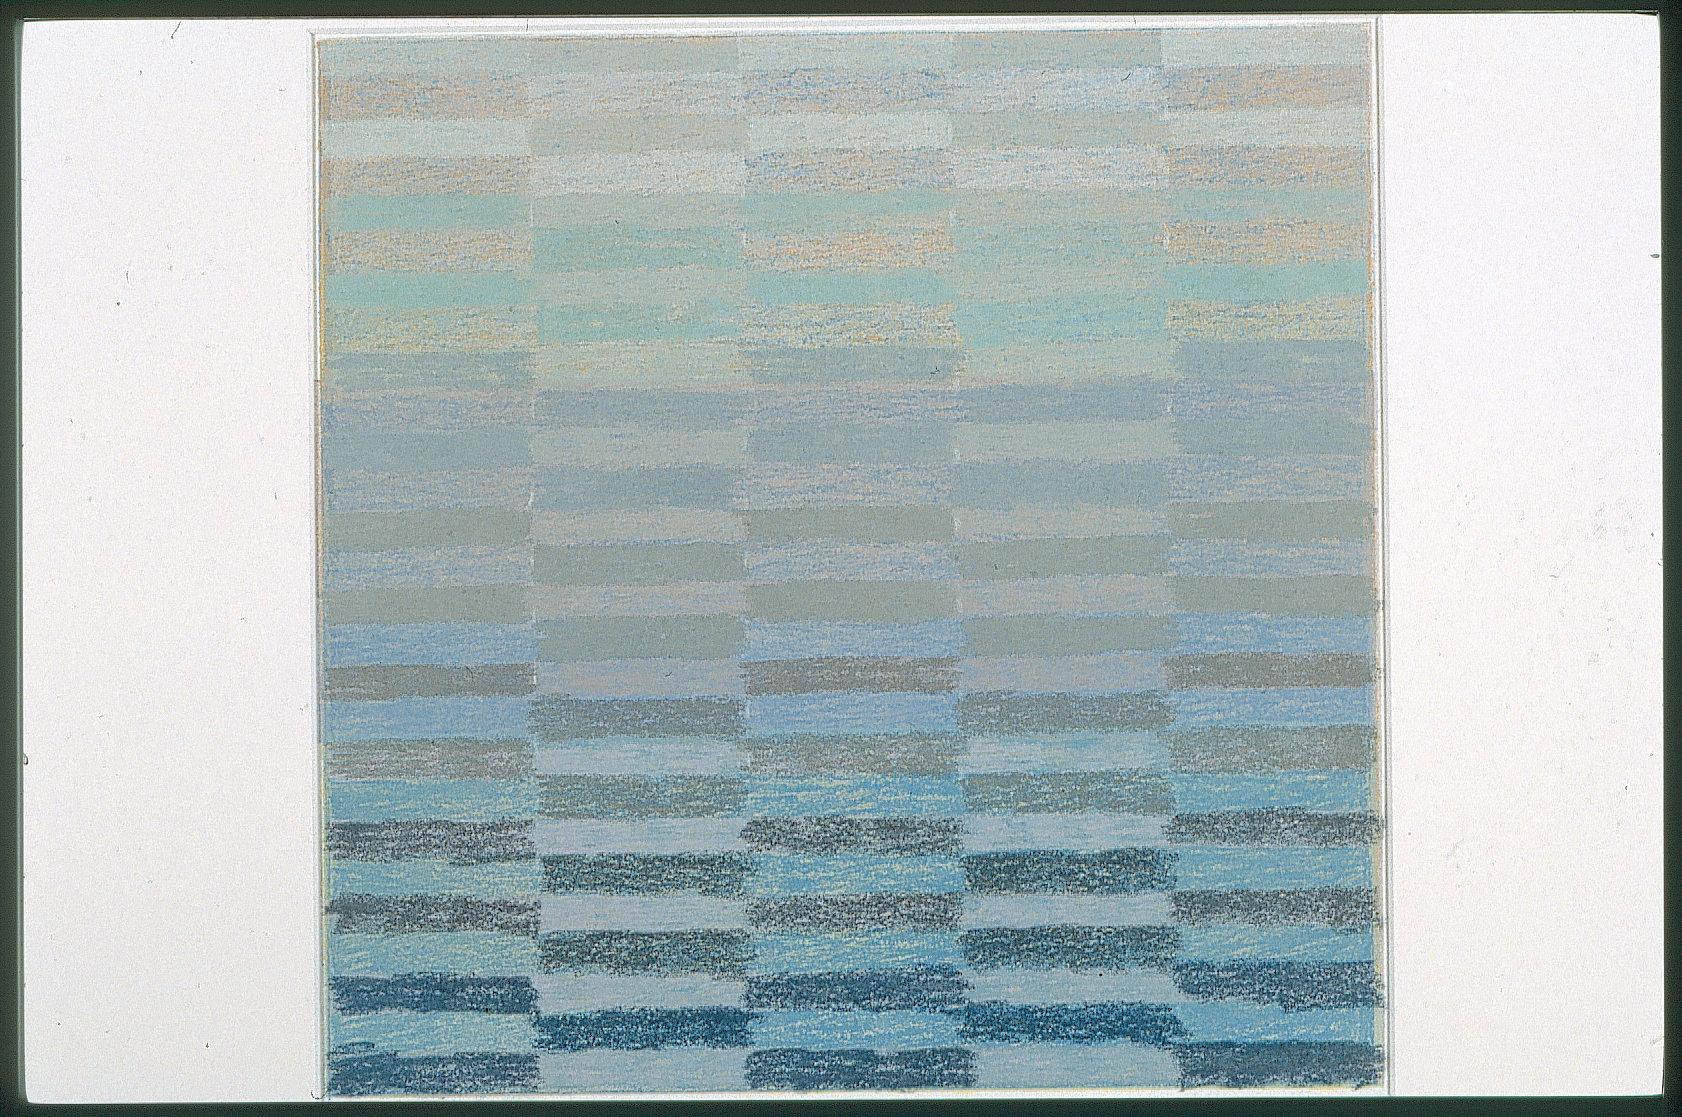 1999, Strip to Stripe, pastel on silkscreen, 27x27, Slide28.jpg